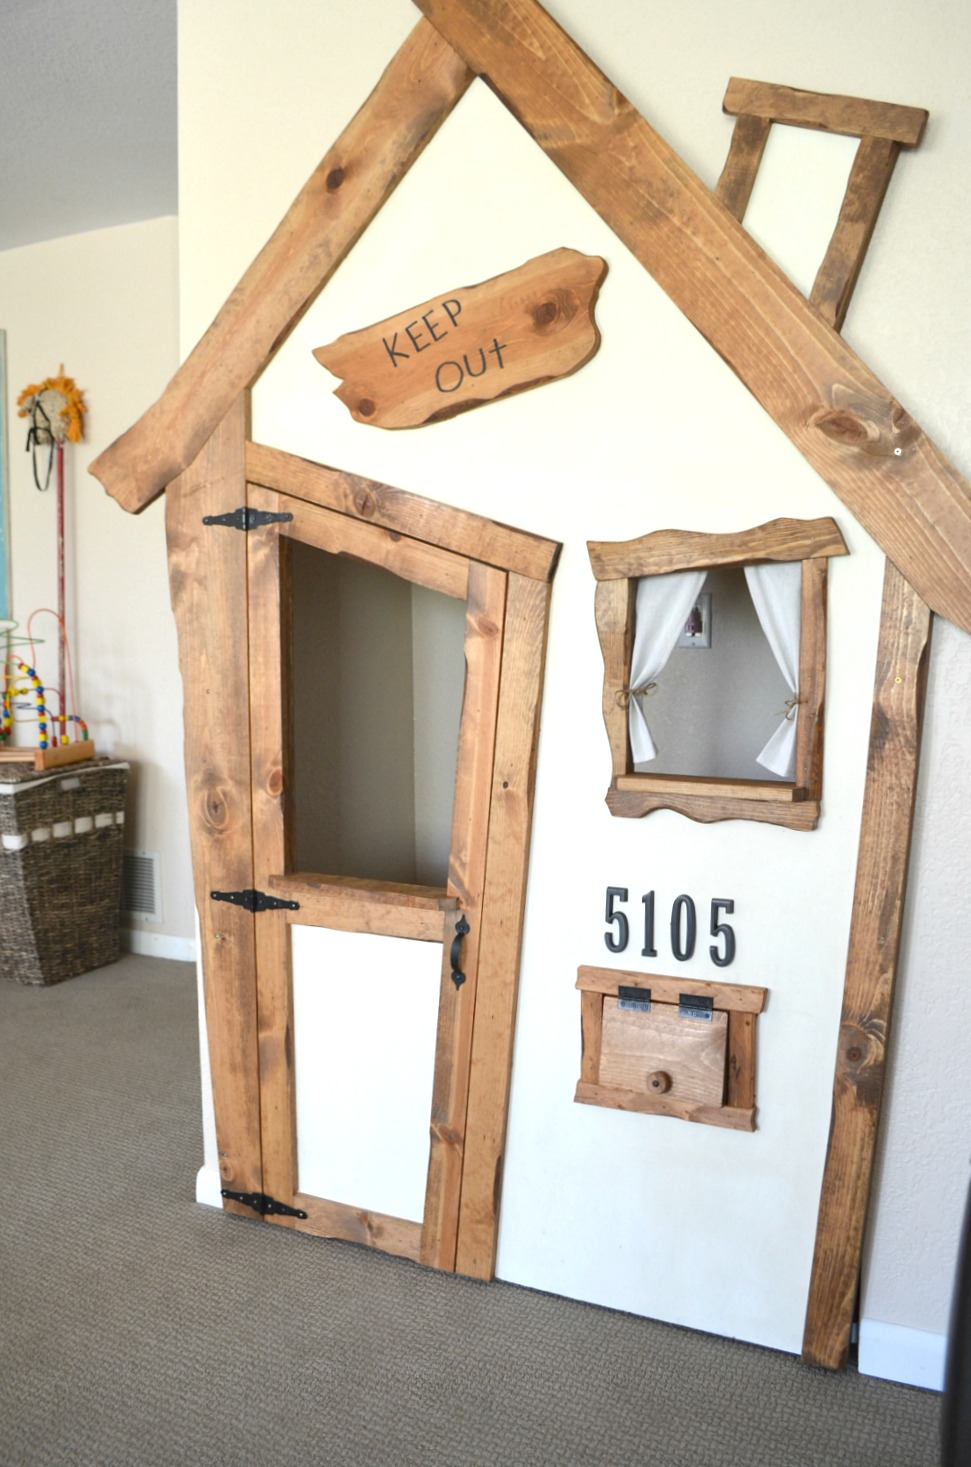 Diy indoor playhouse transformation little vintage nest for Diy indoor playhouse